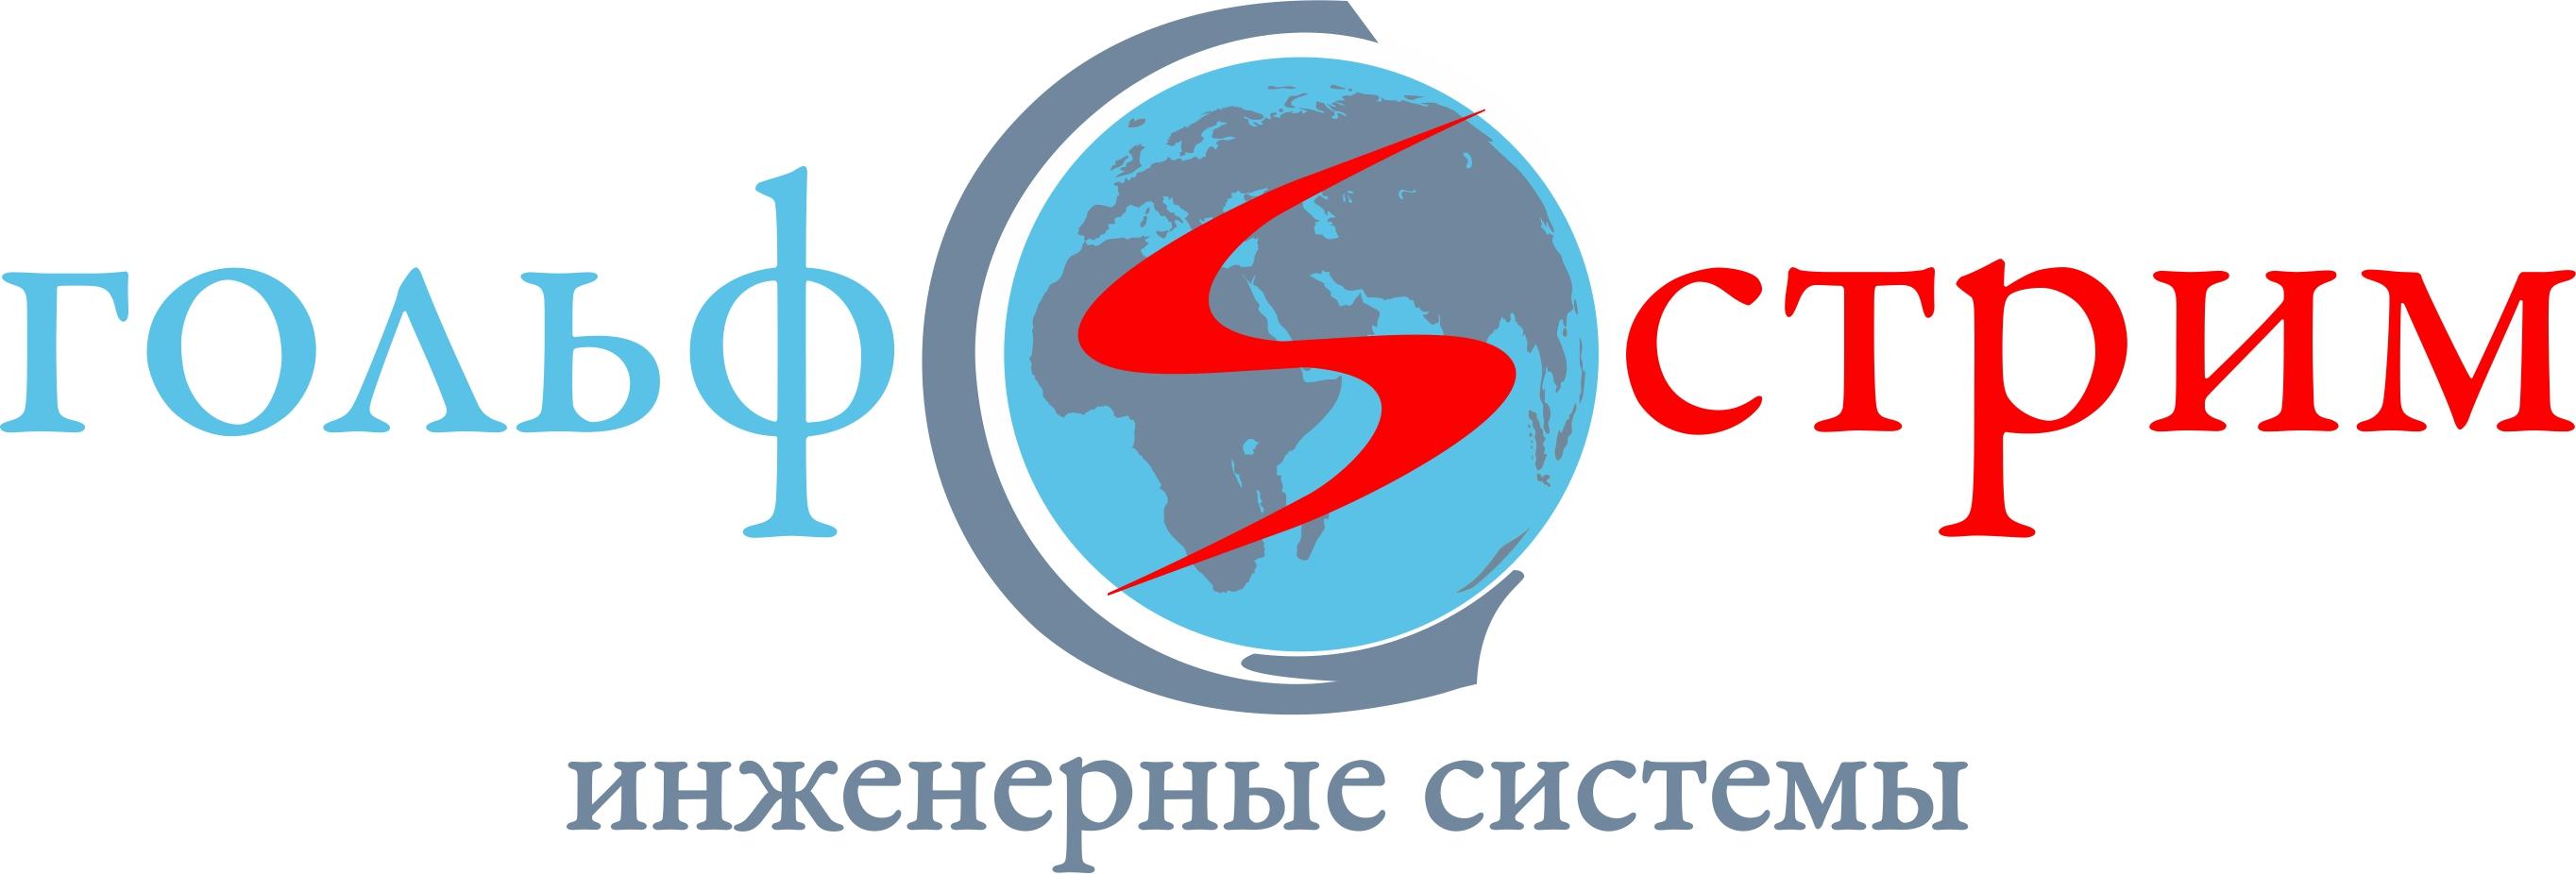 Гольфстрим Краснодар